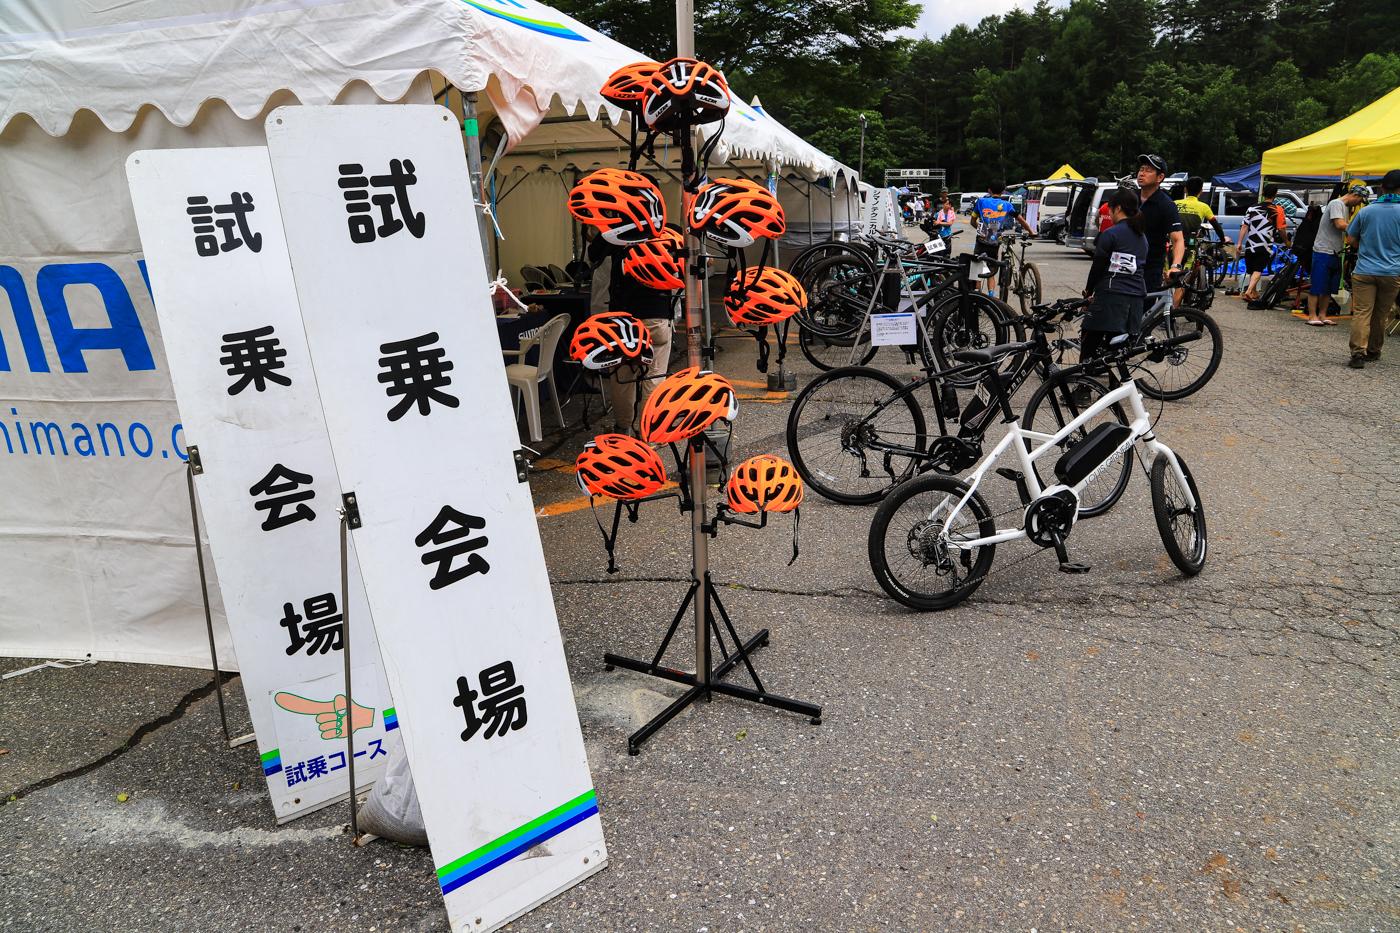 shimanobike-41.jpg